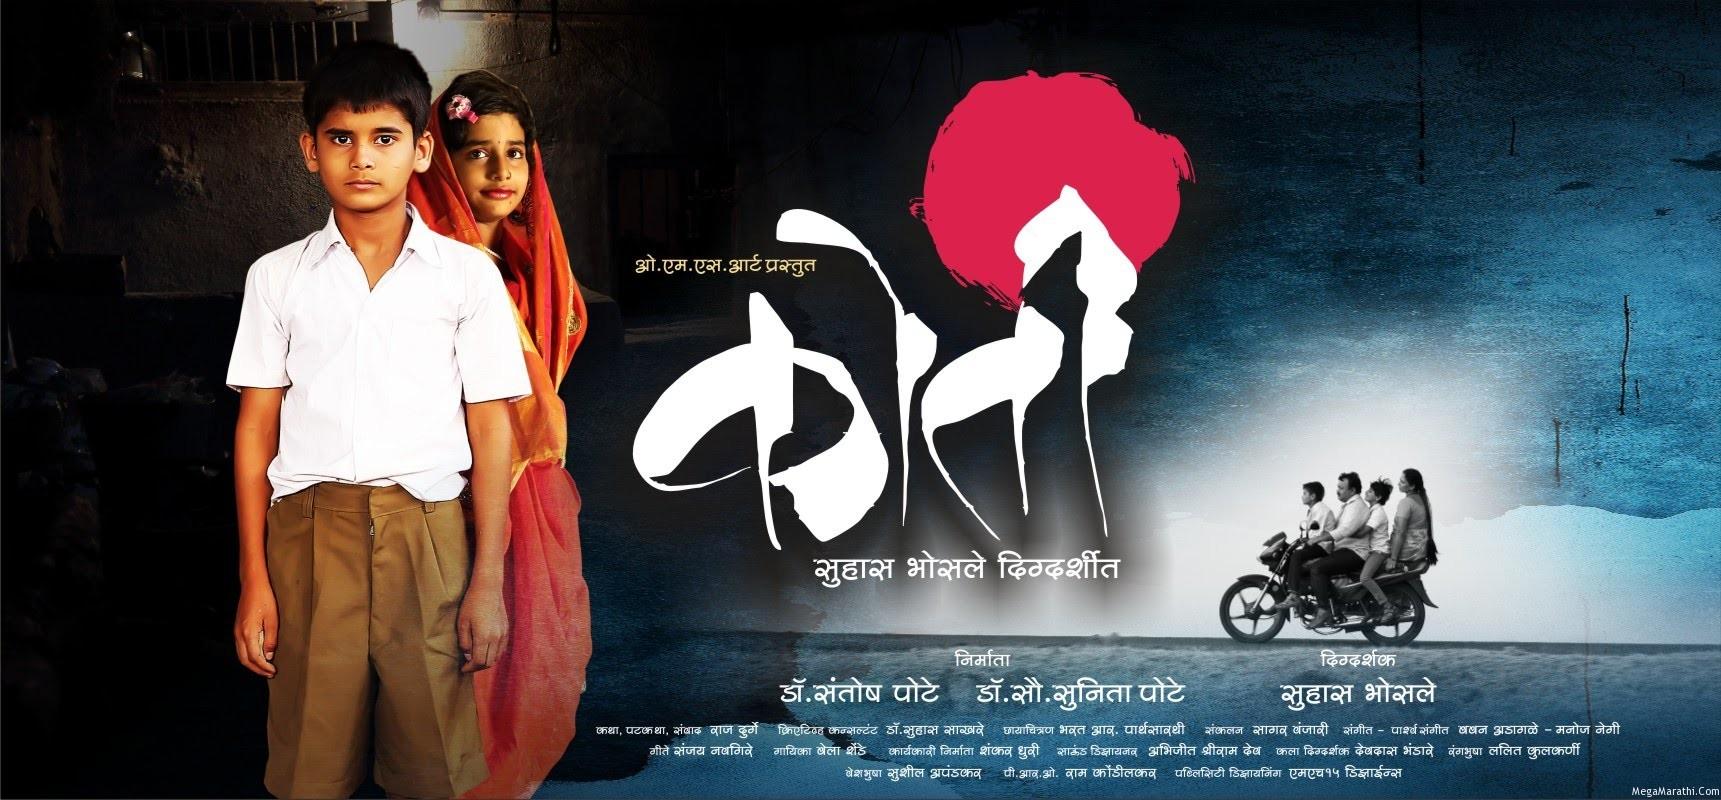 Marathi movies full 2016 - Il senso della vita monty python trailer